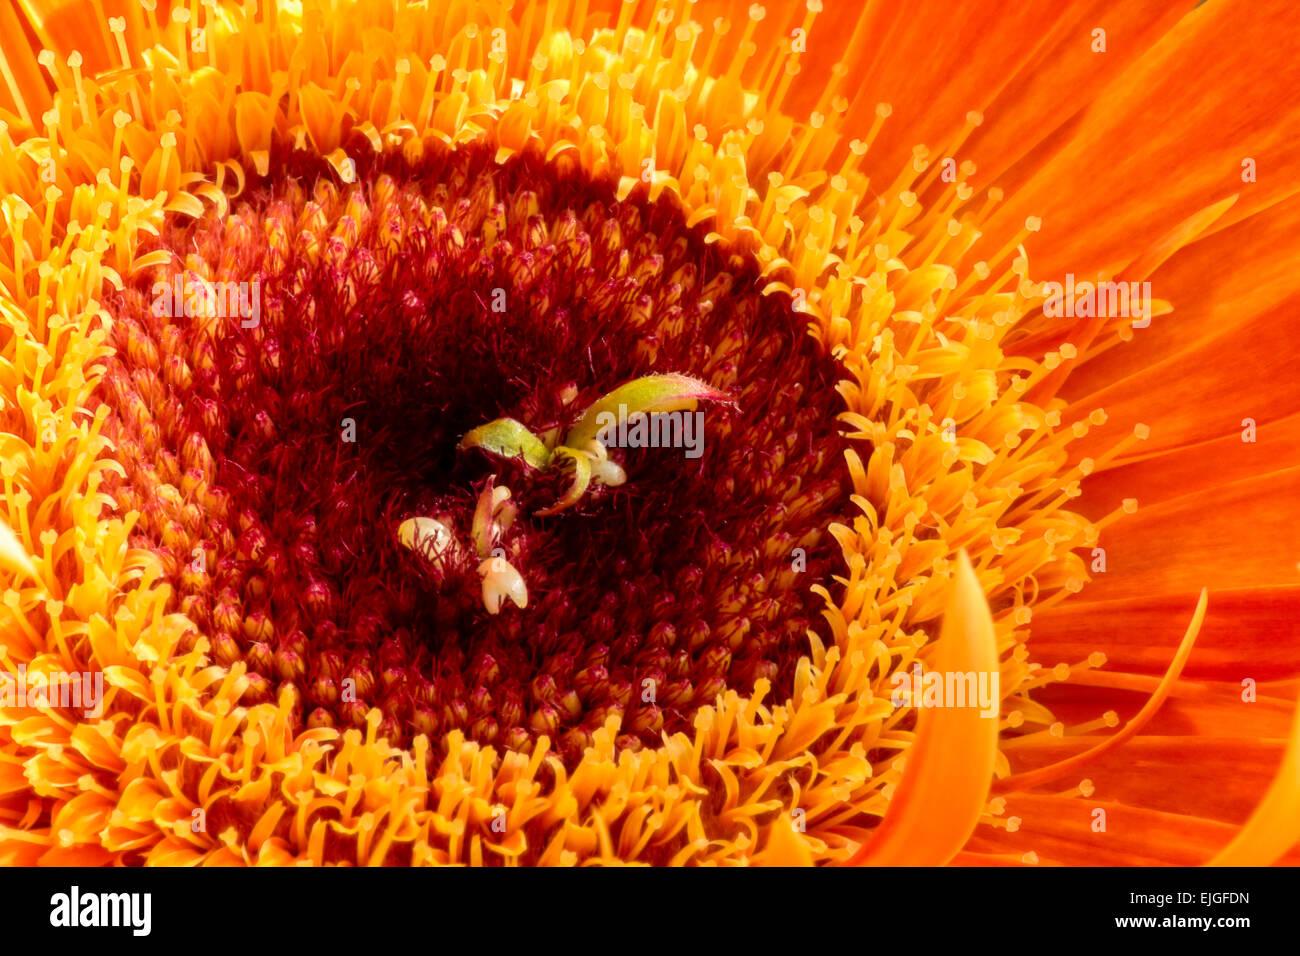 Close-up / Macro  of an Orange Gerbera Daisy - Stock Image